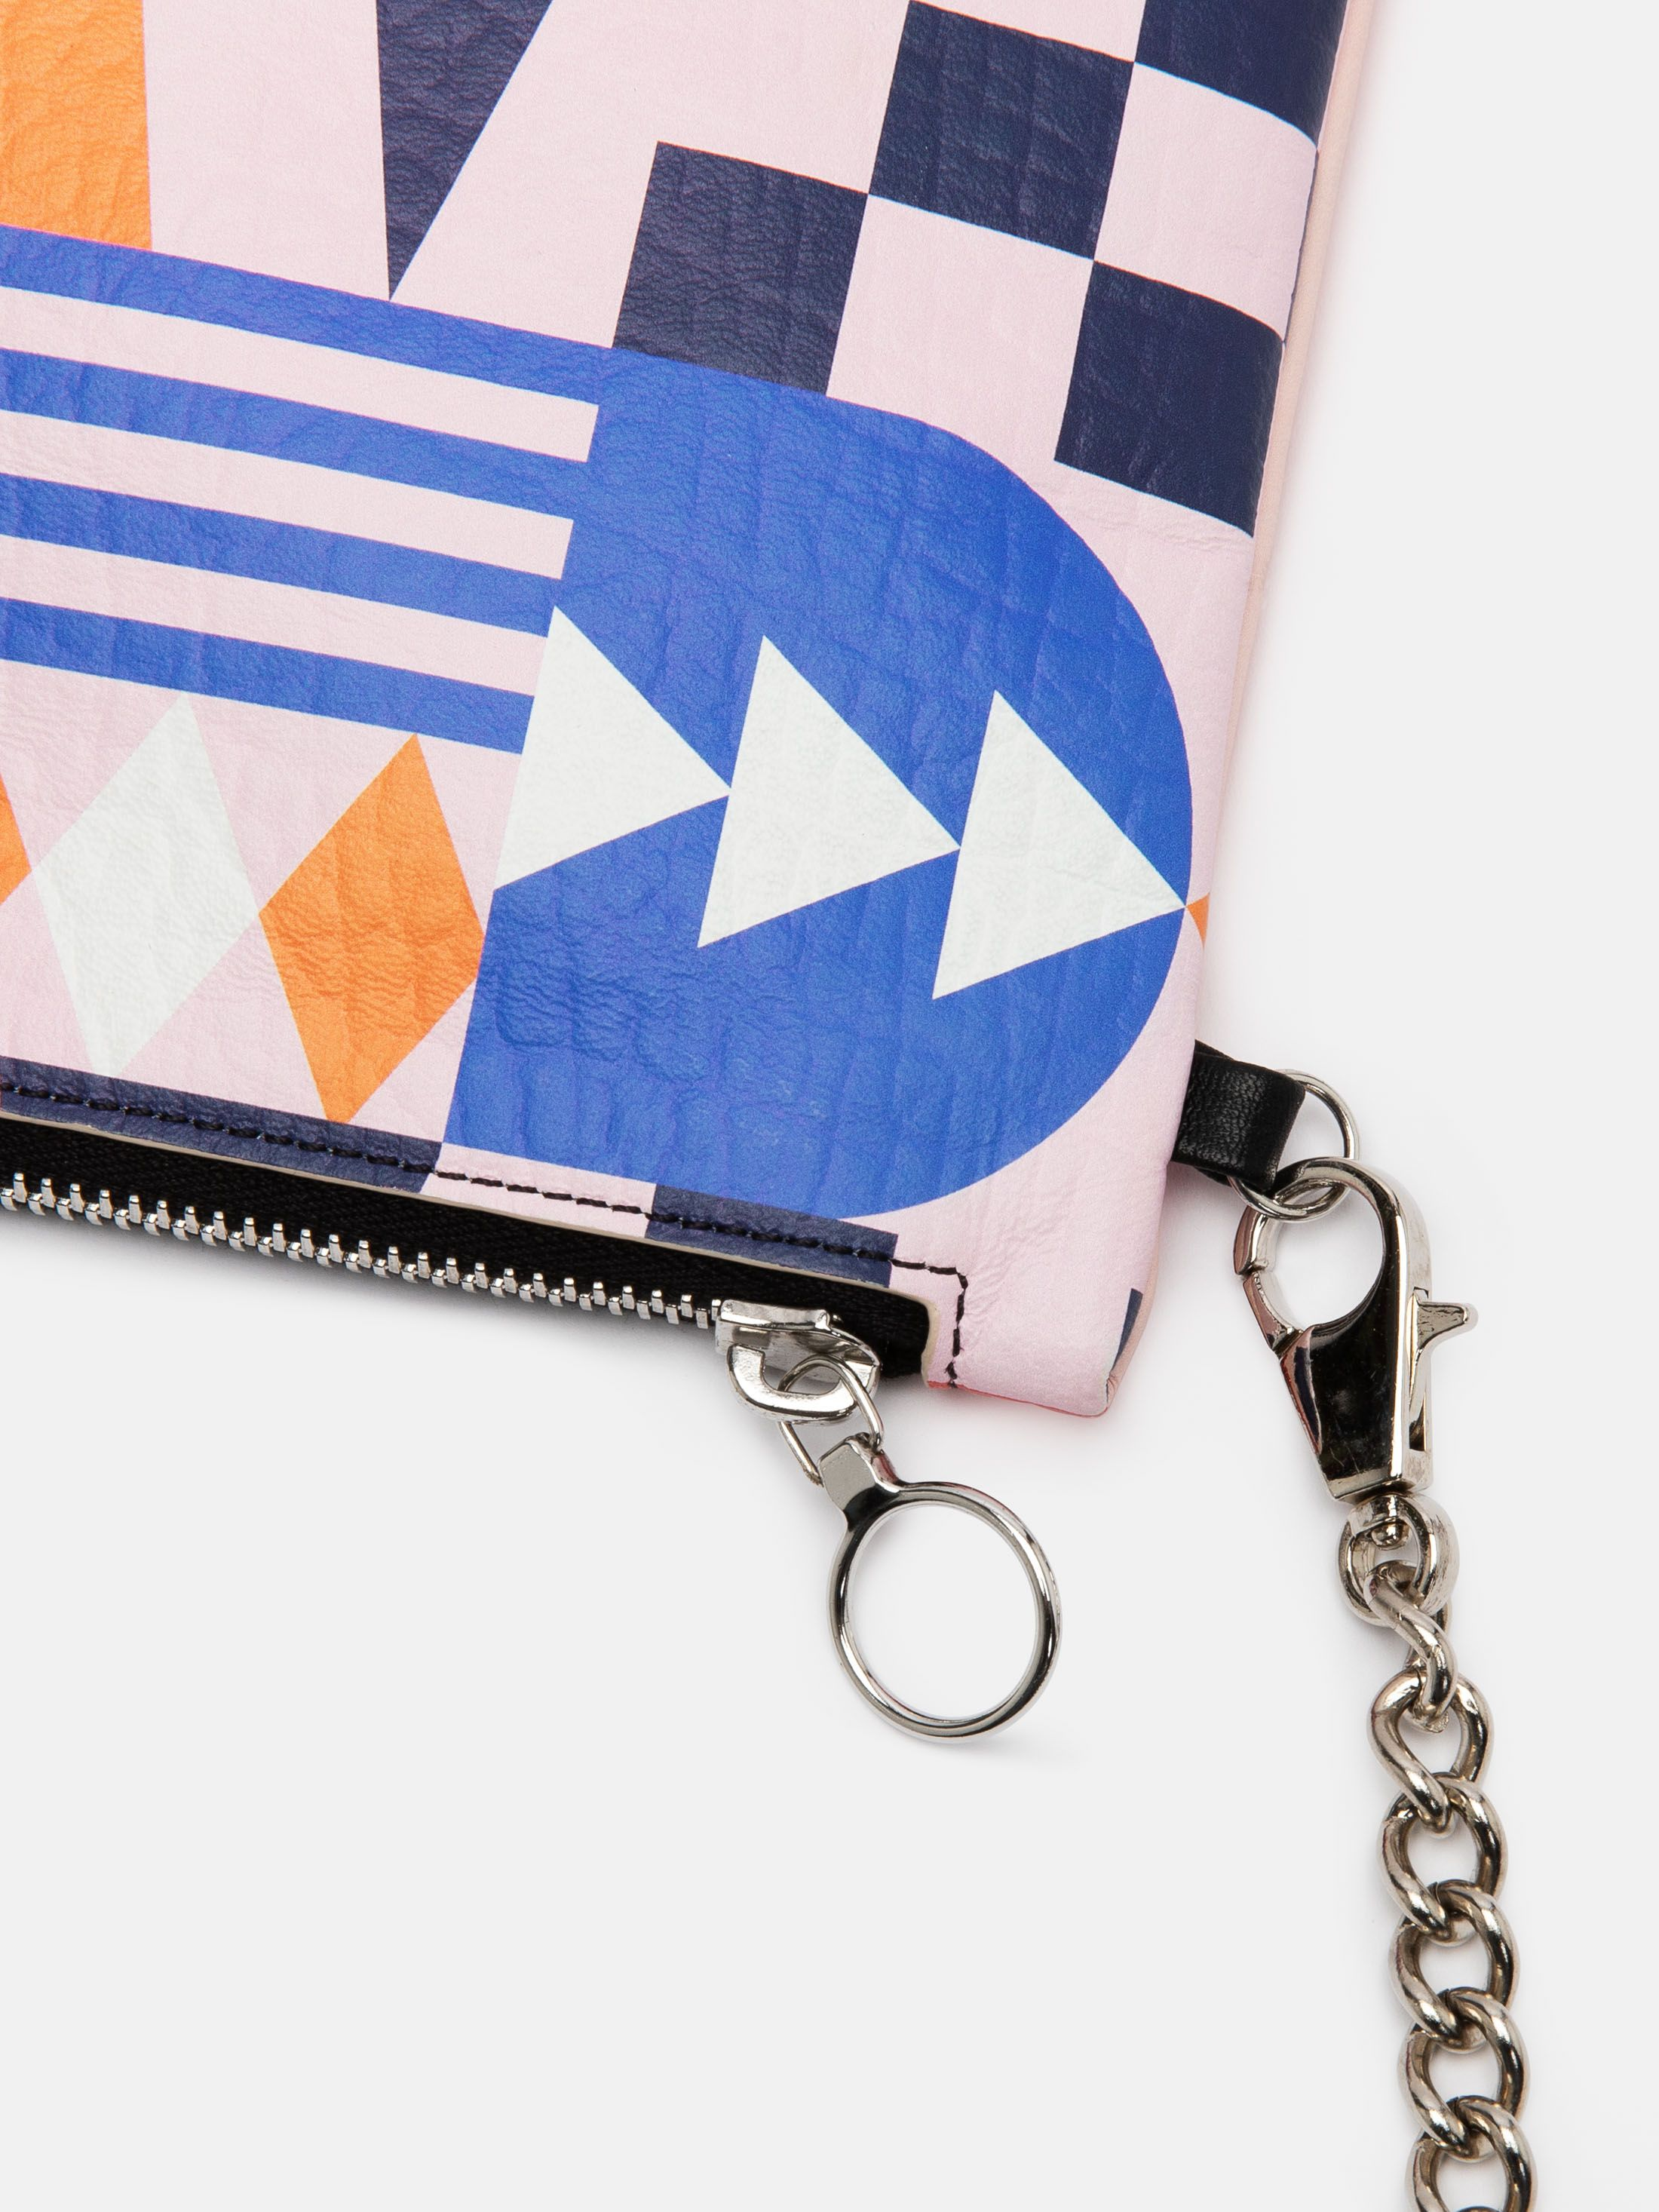 custom crossbody bag detailing